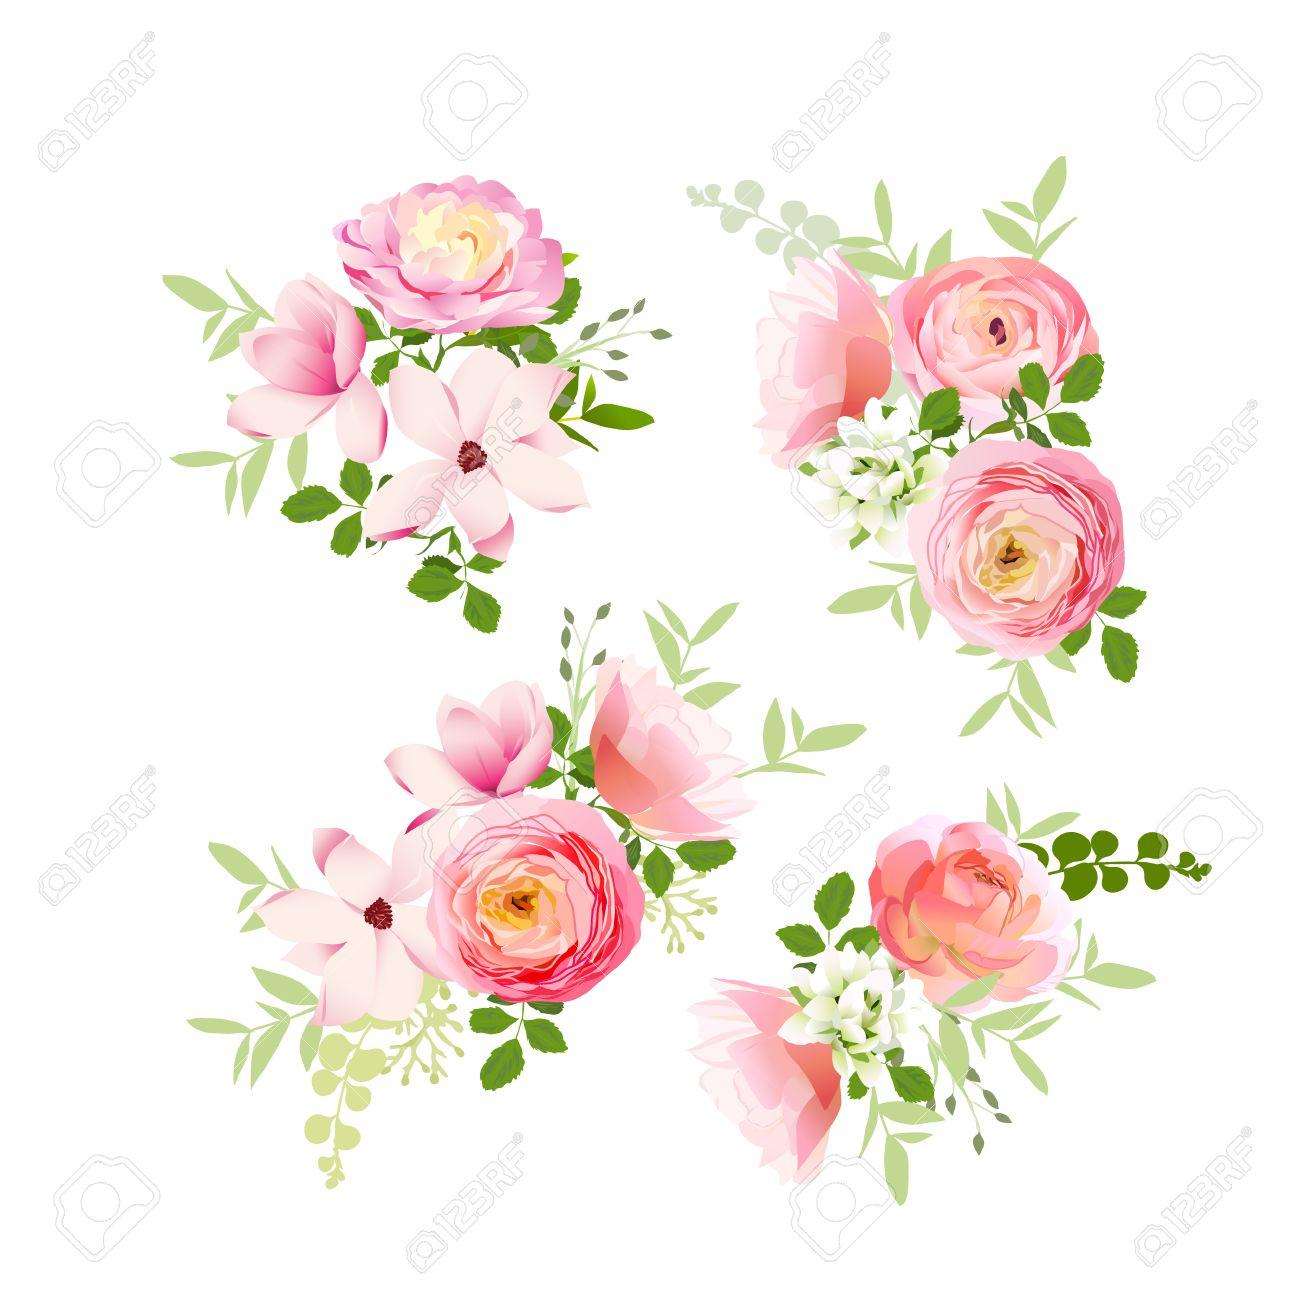 Wedding bouquets of fresh roses, magnolia, ranunculus vector design elements - 52130672